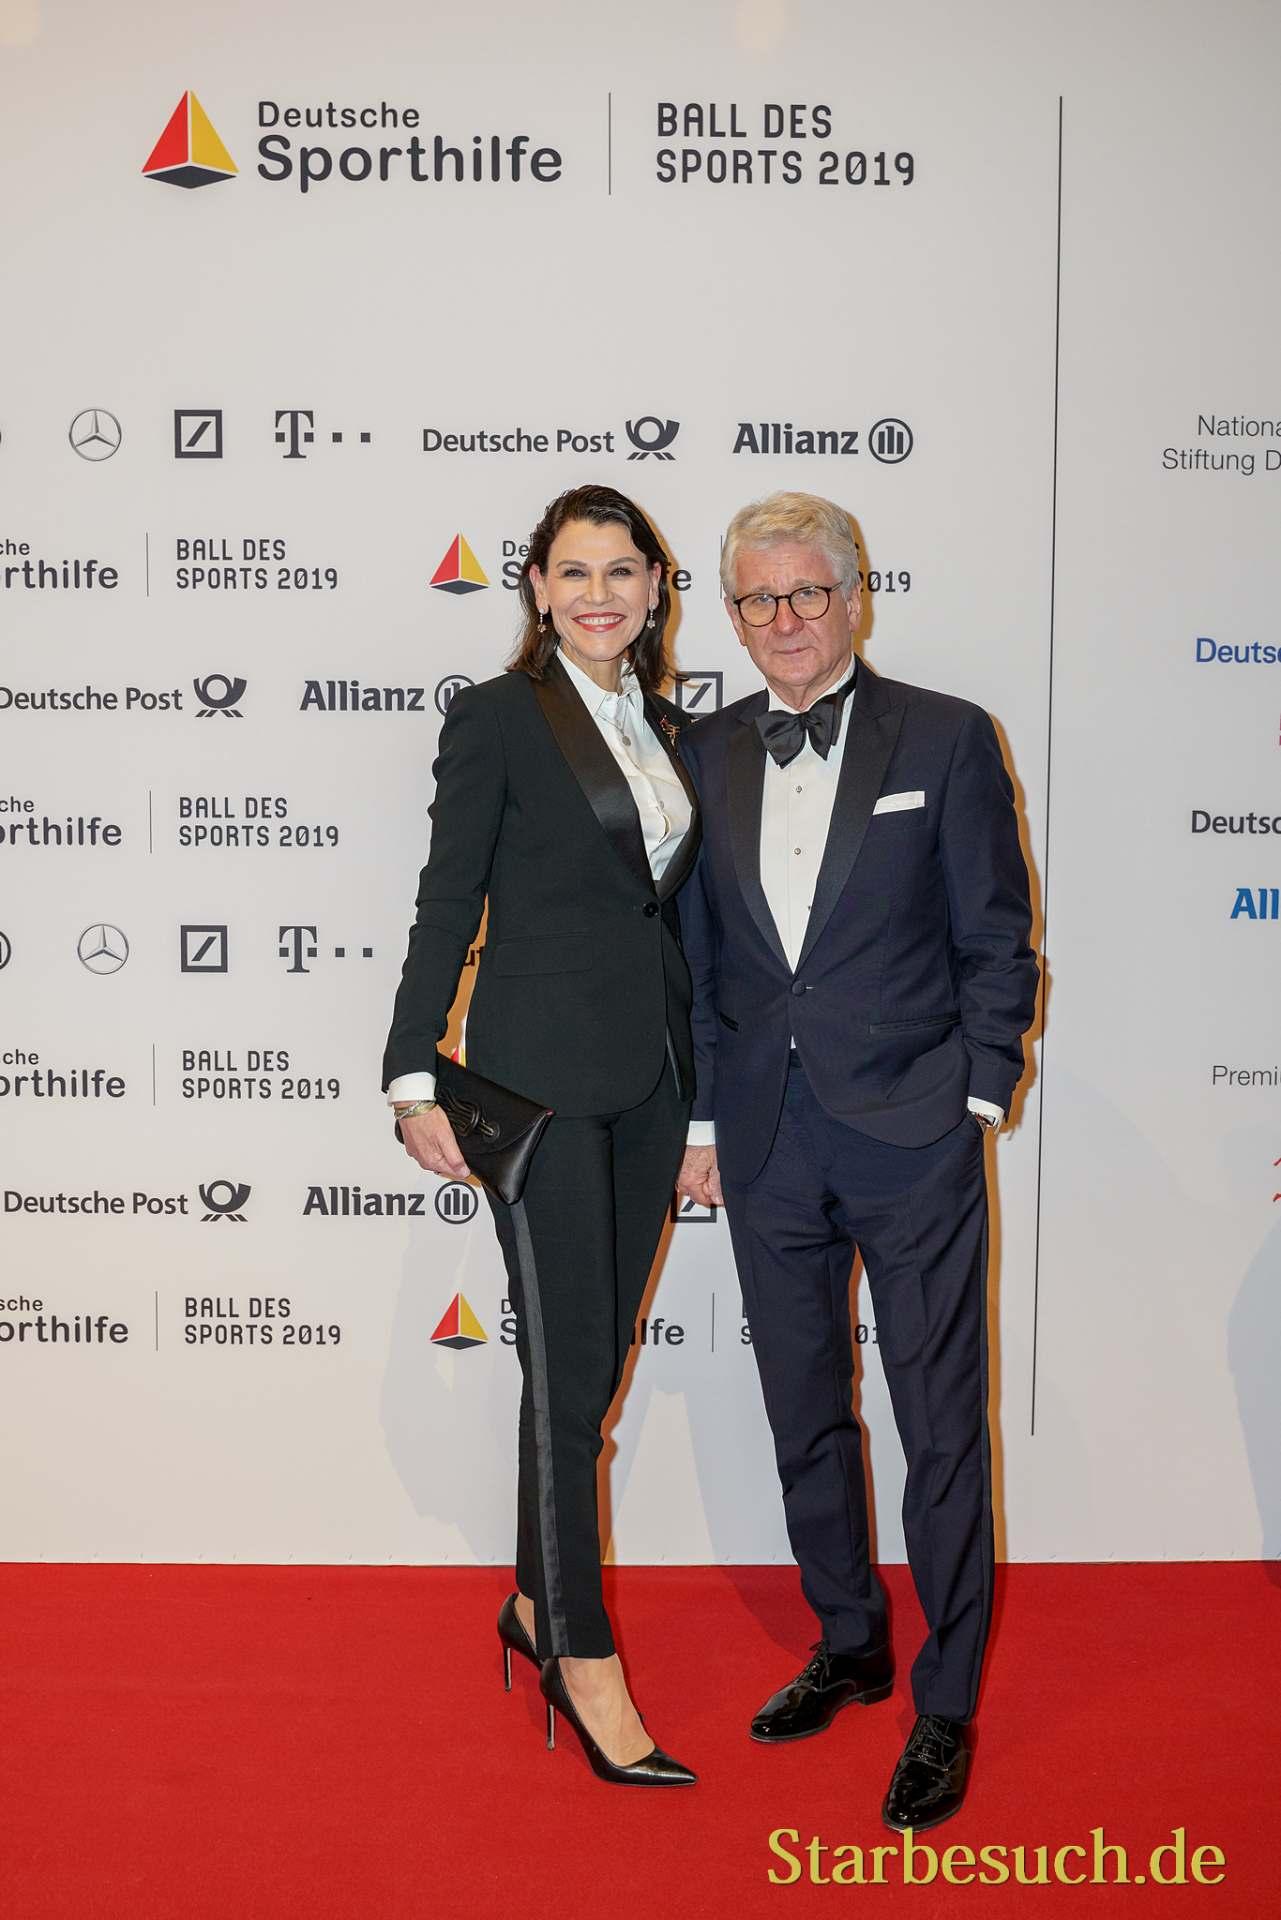 WIESBADEN, Germany - February 2nd, 2019: Marcel Reif (*1949, German sport journalist) at Ball des Sports 2019